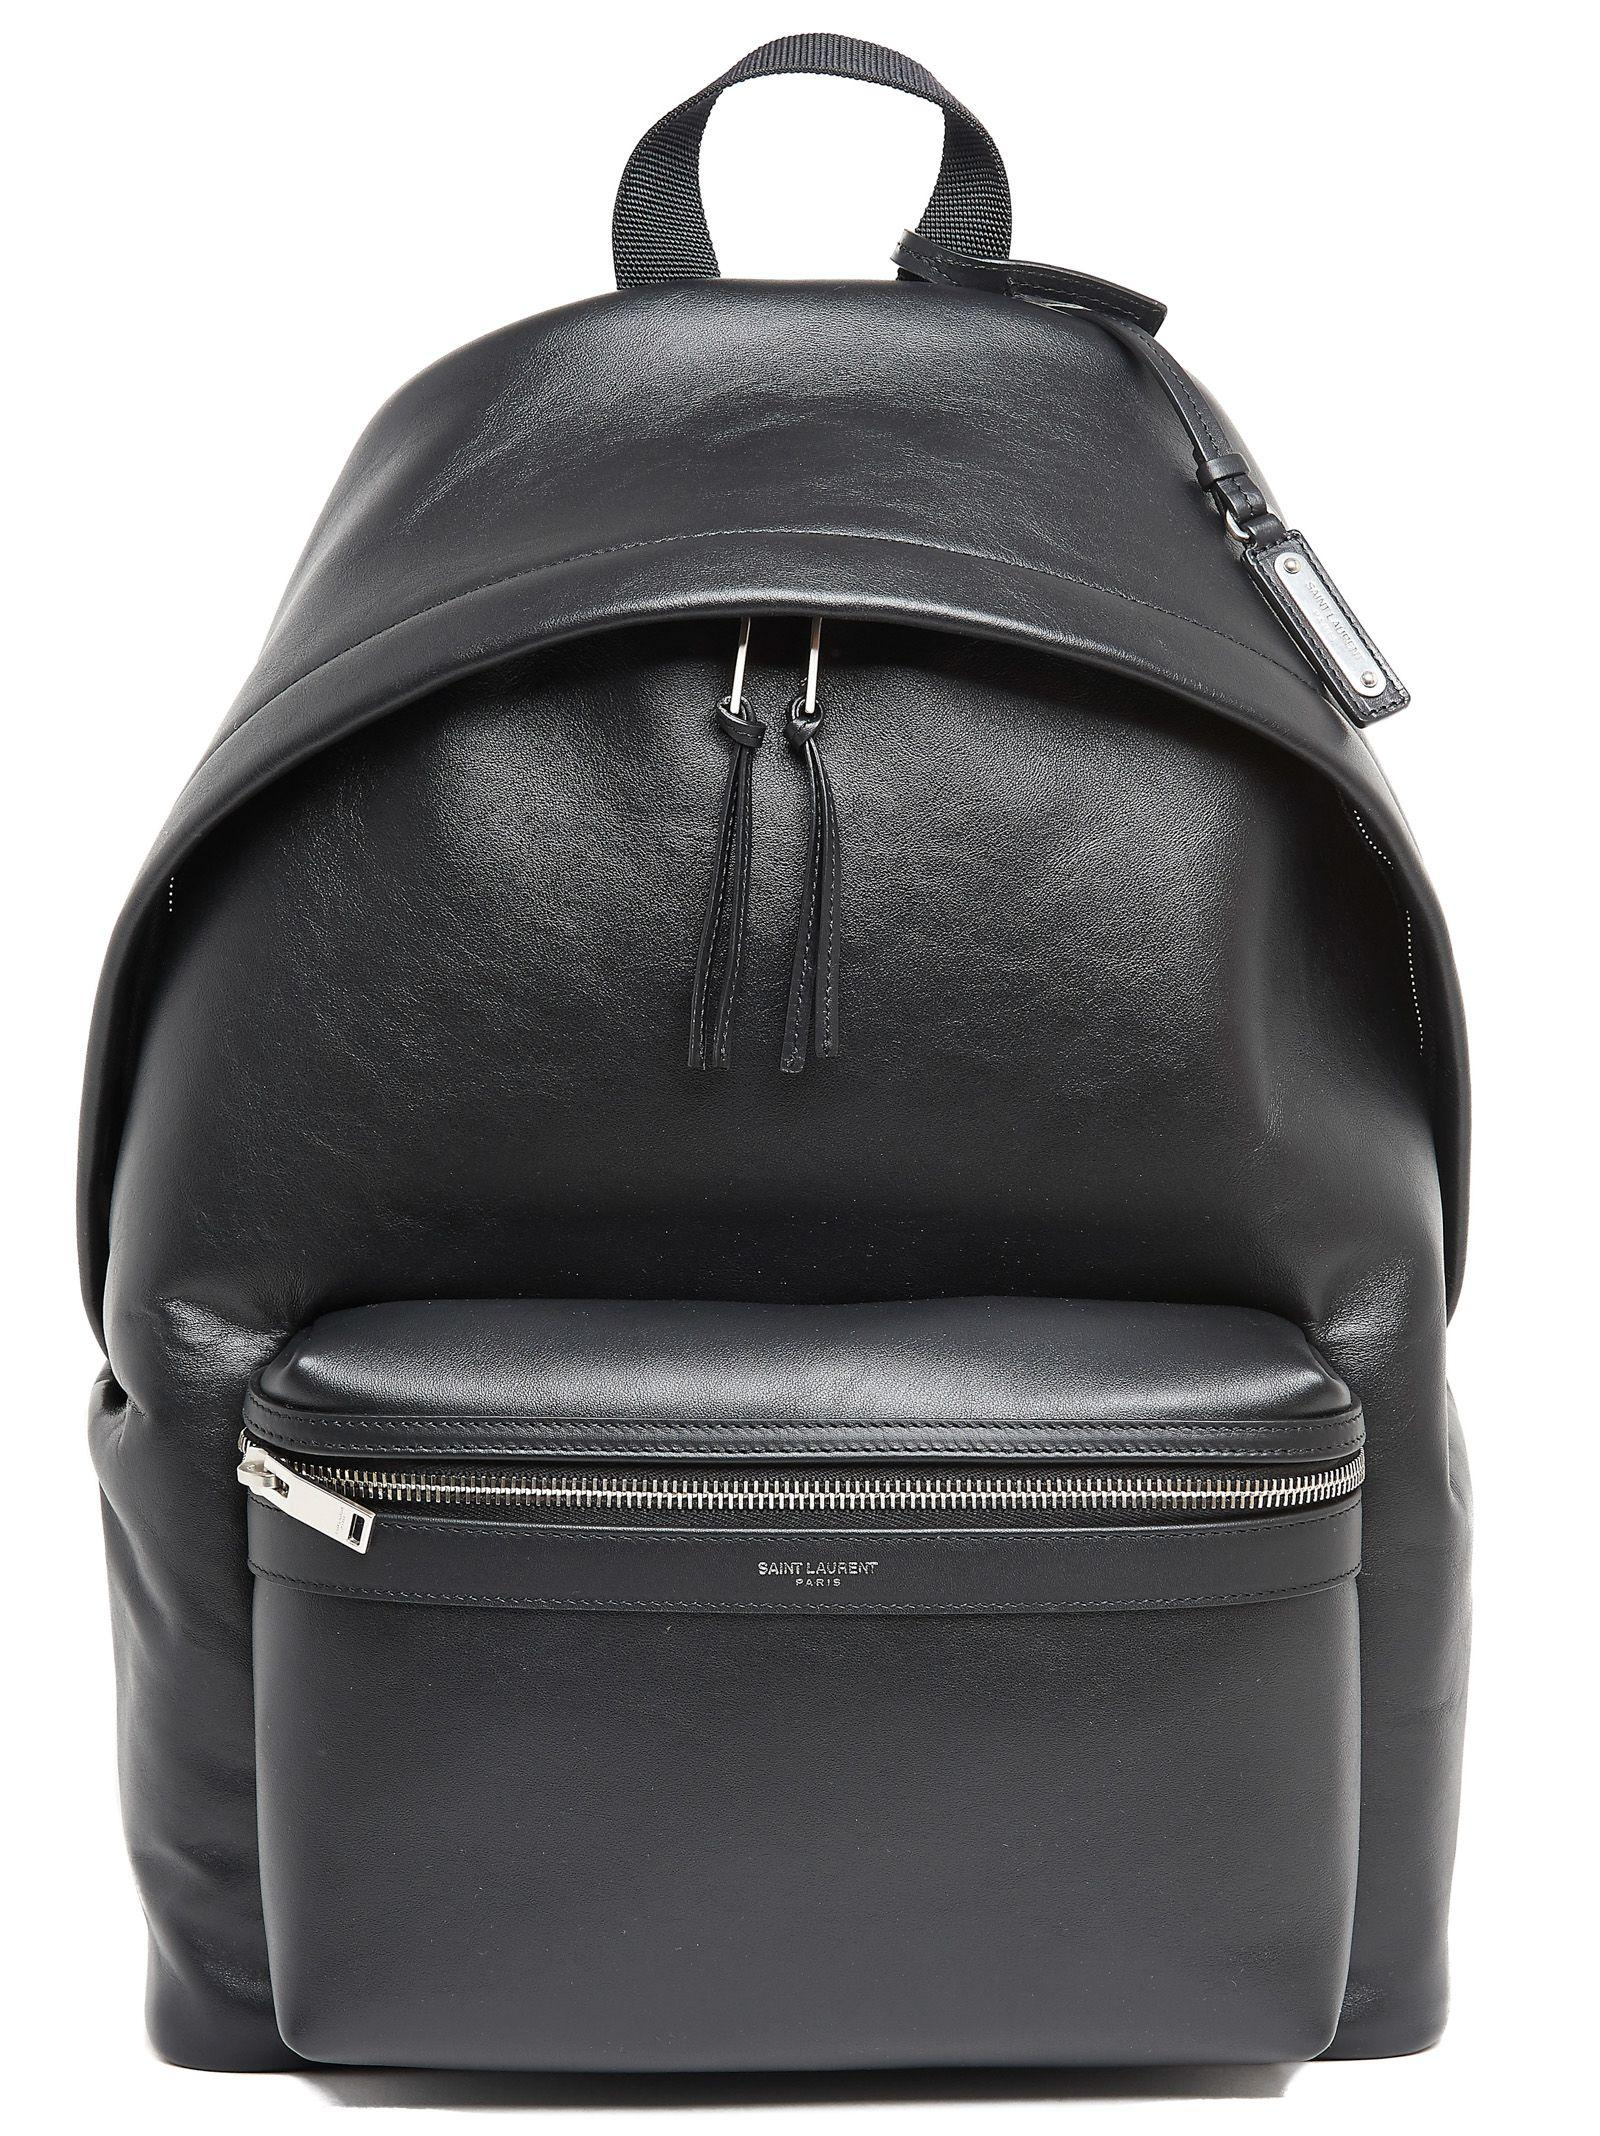 dca04604ce13 Saint Laurent Men S City Foldable Leather Backpack In Black